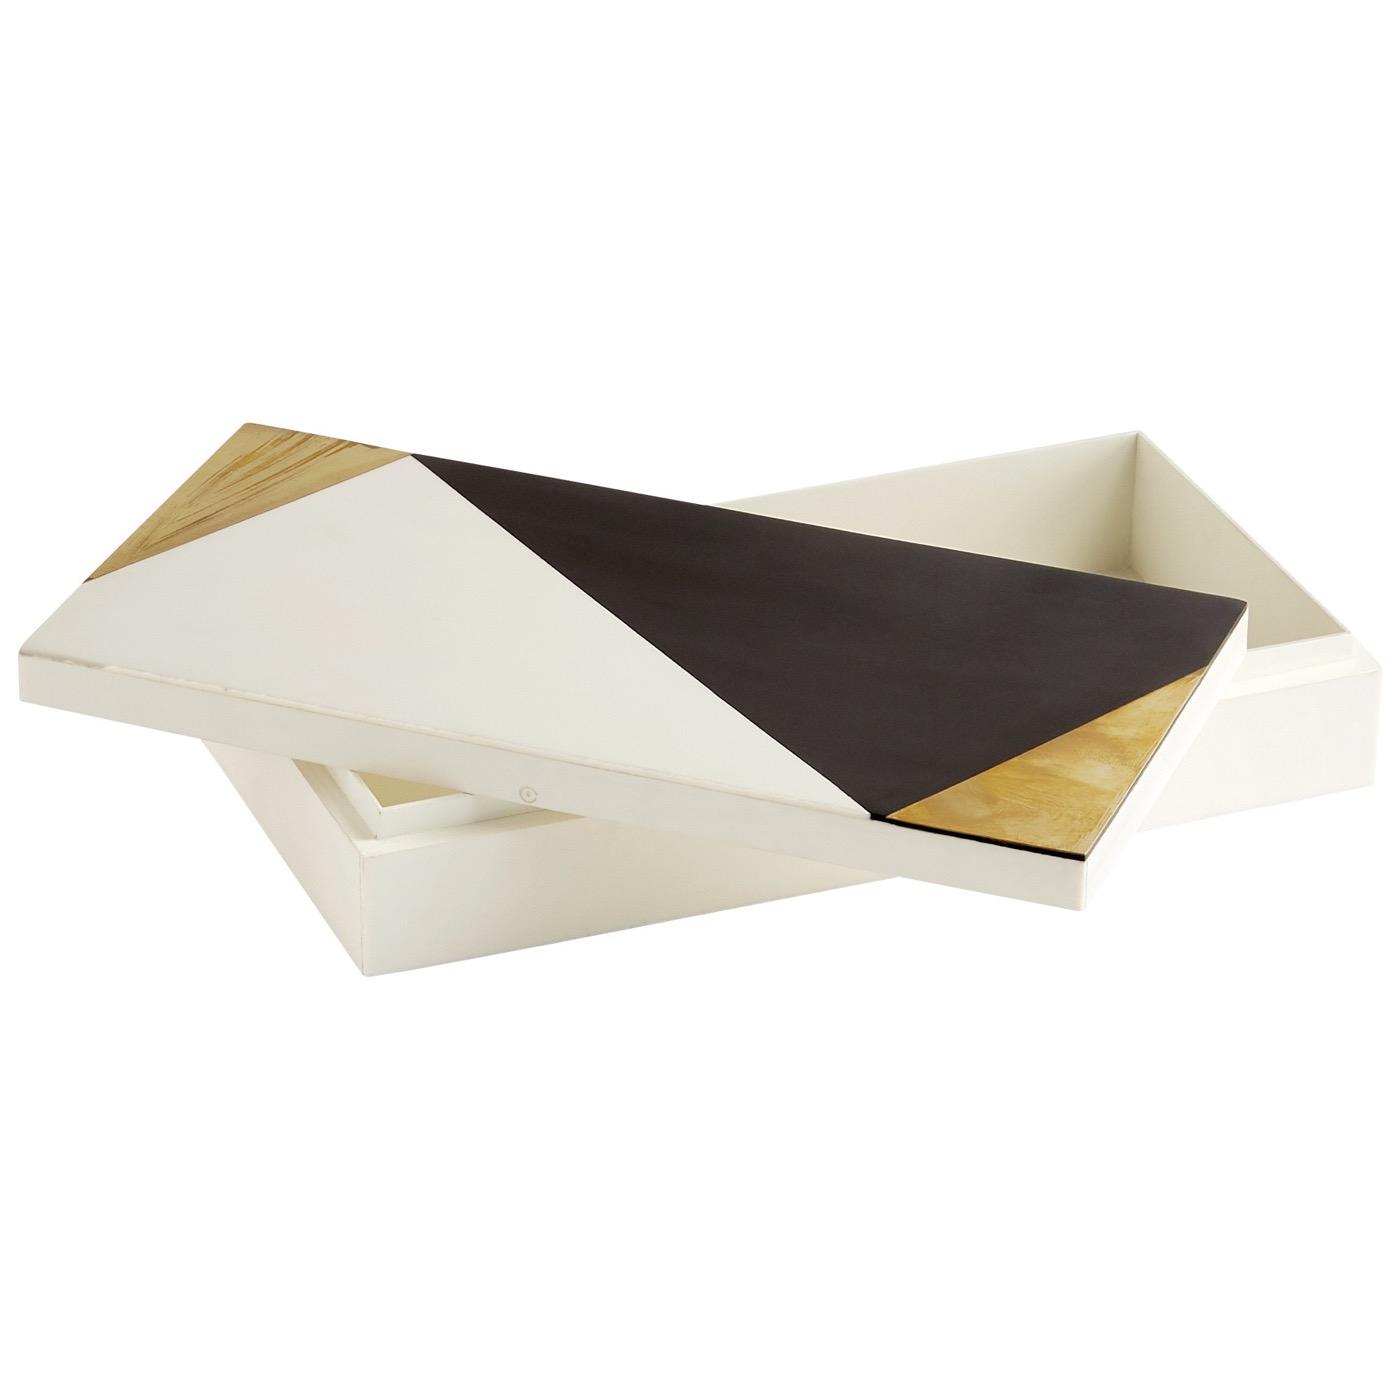 Bogart Geometric Boxes